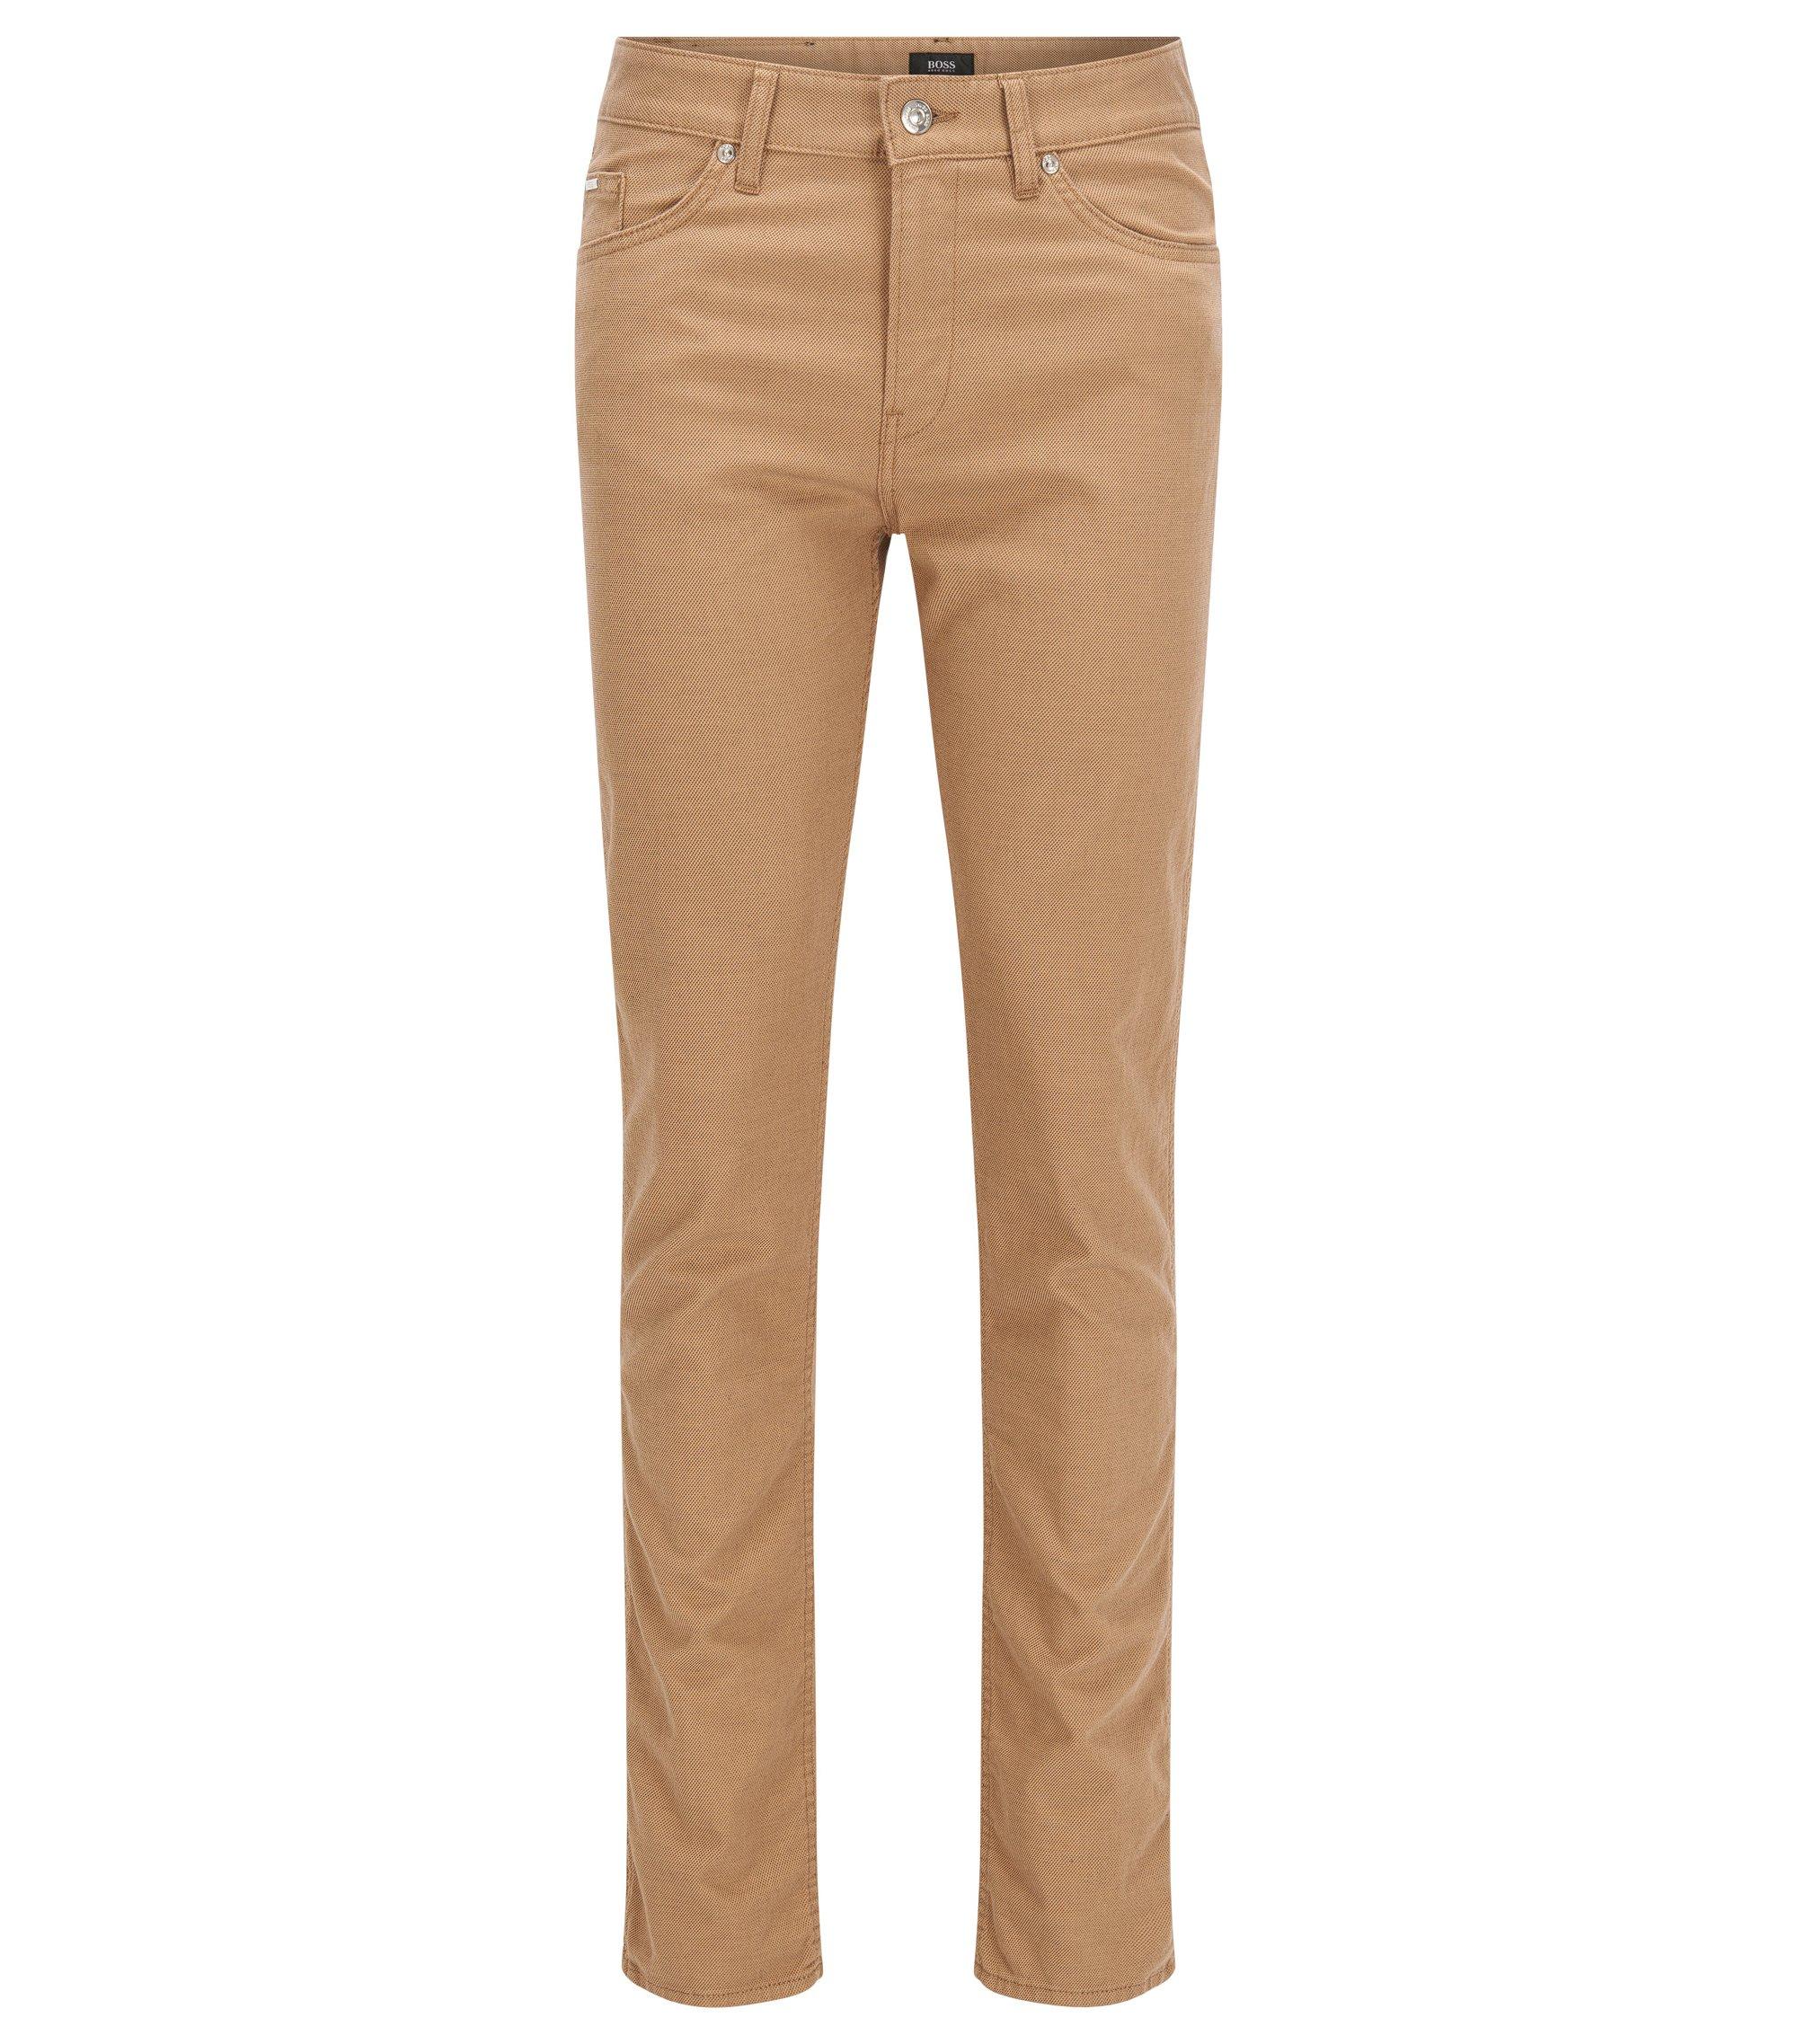 10 oz Stretch Cotton Blend Pants, Slim Fit | Delaware, Beige